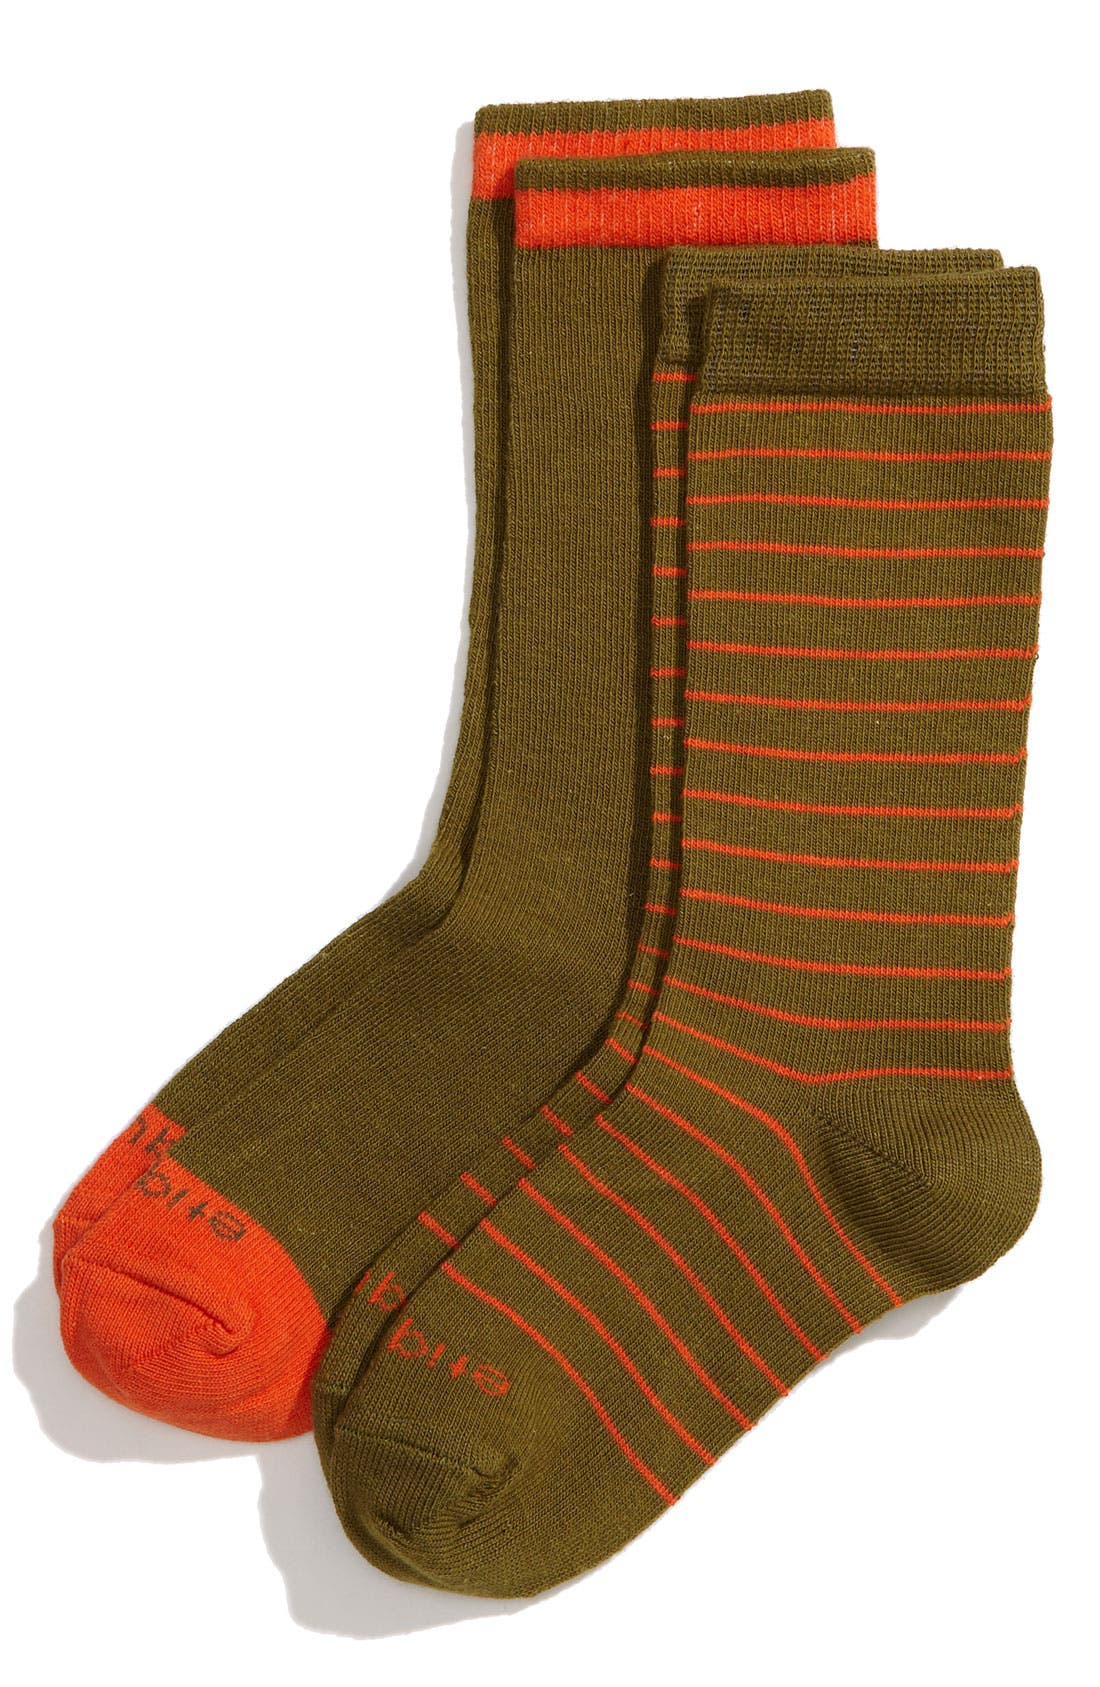 Main Image - Etiquette Clothiers 'Needle Stripe' Socks (2-Pack) (Toddler & Little Kid)